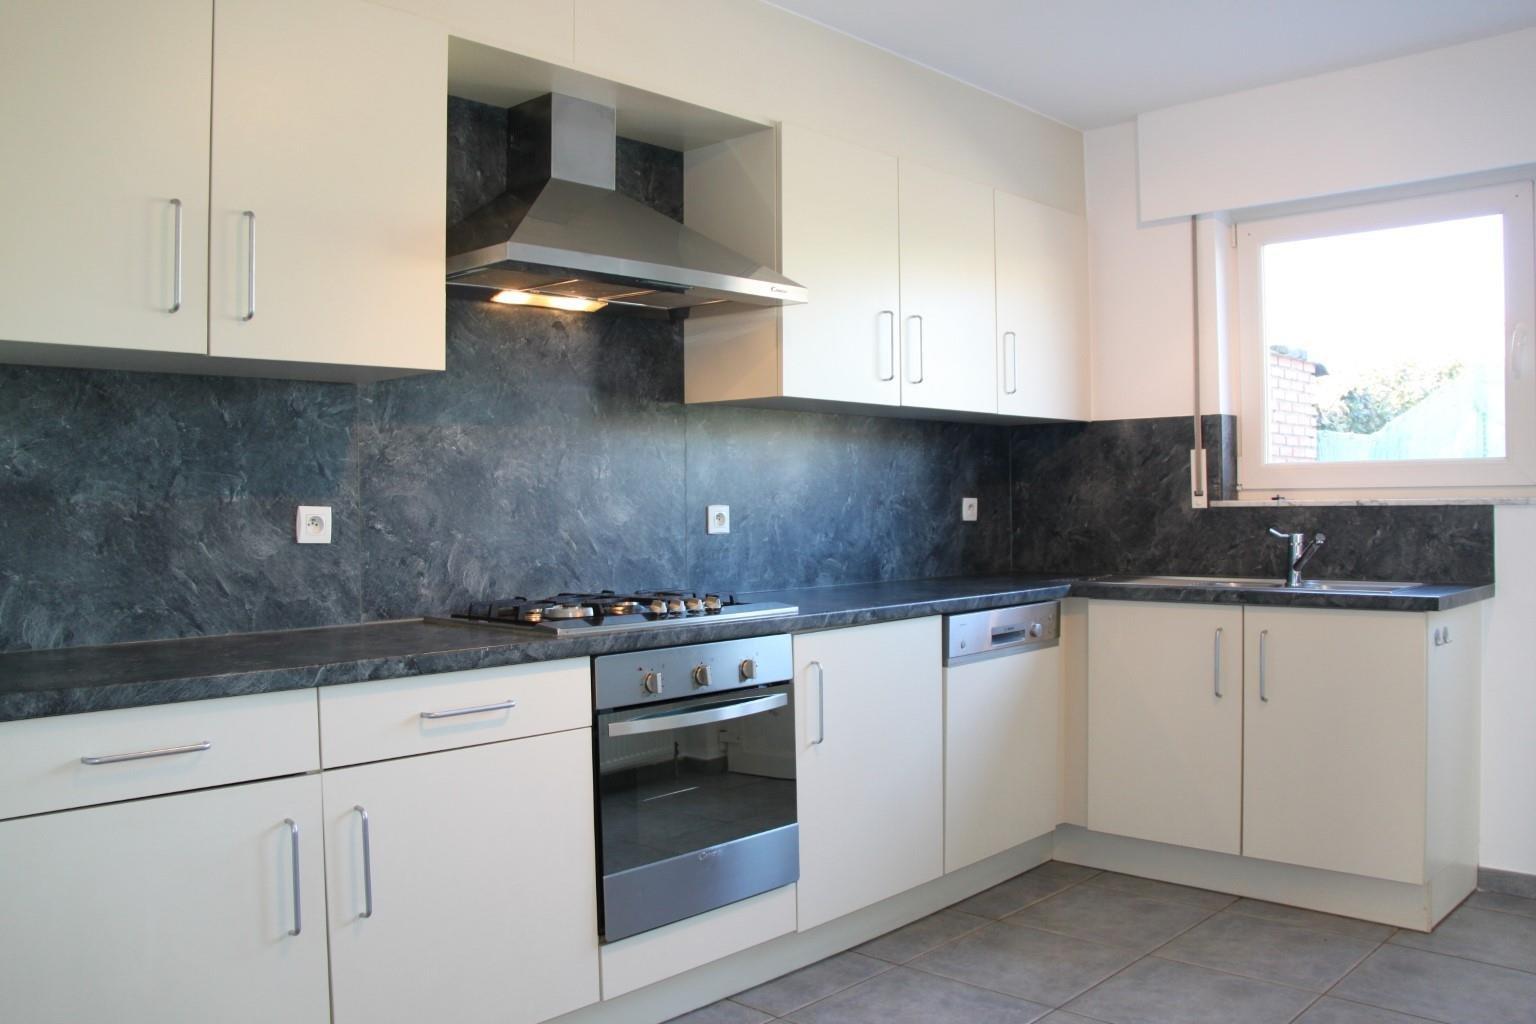 A997W5202103121203/c609f494555e4862abe2410fcdd0a52e/kitchen1.jpg